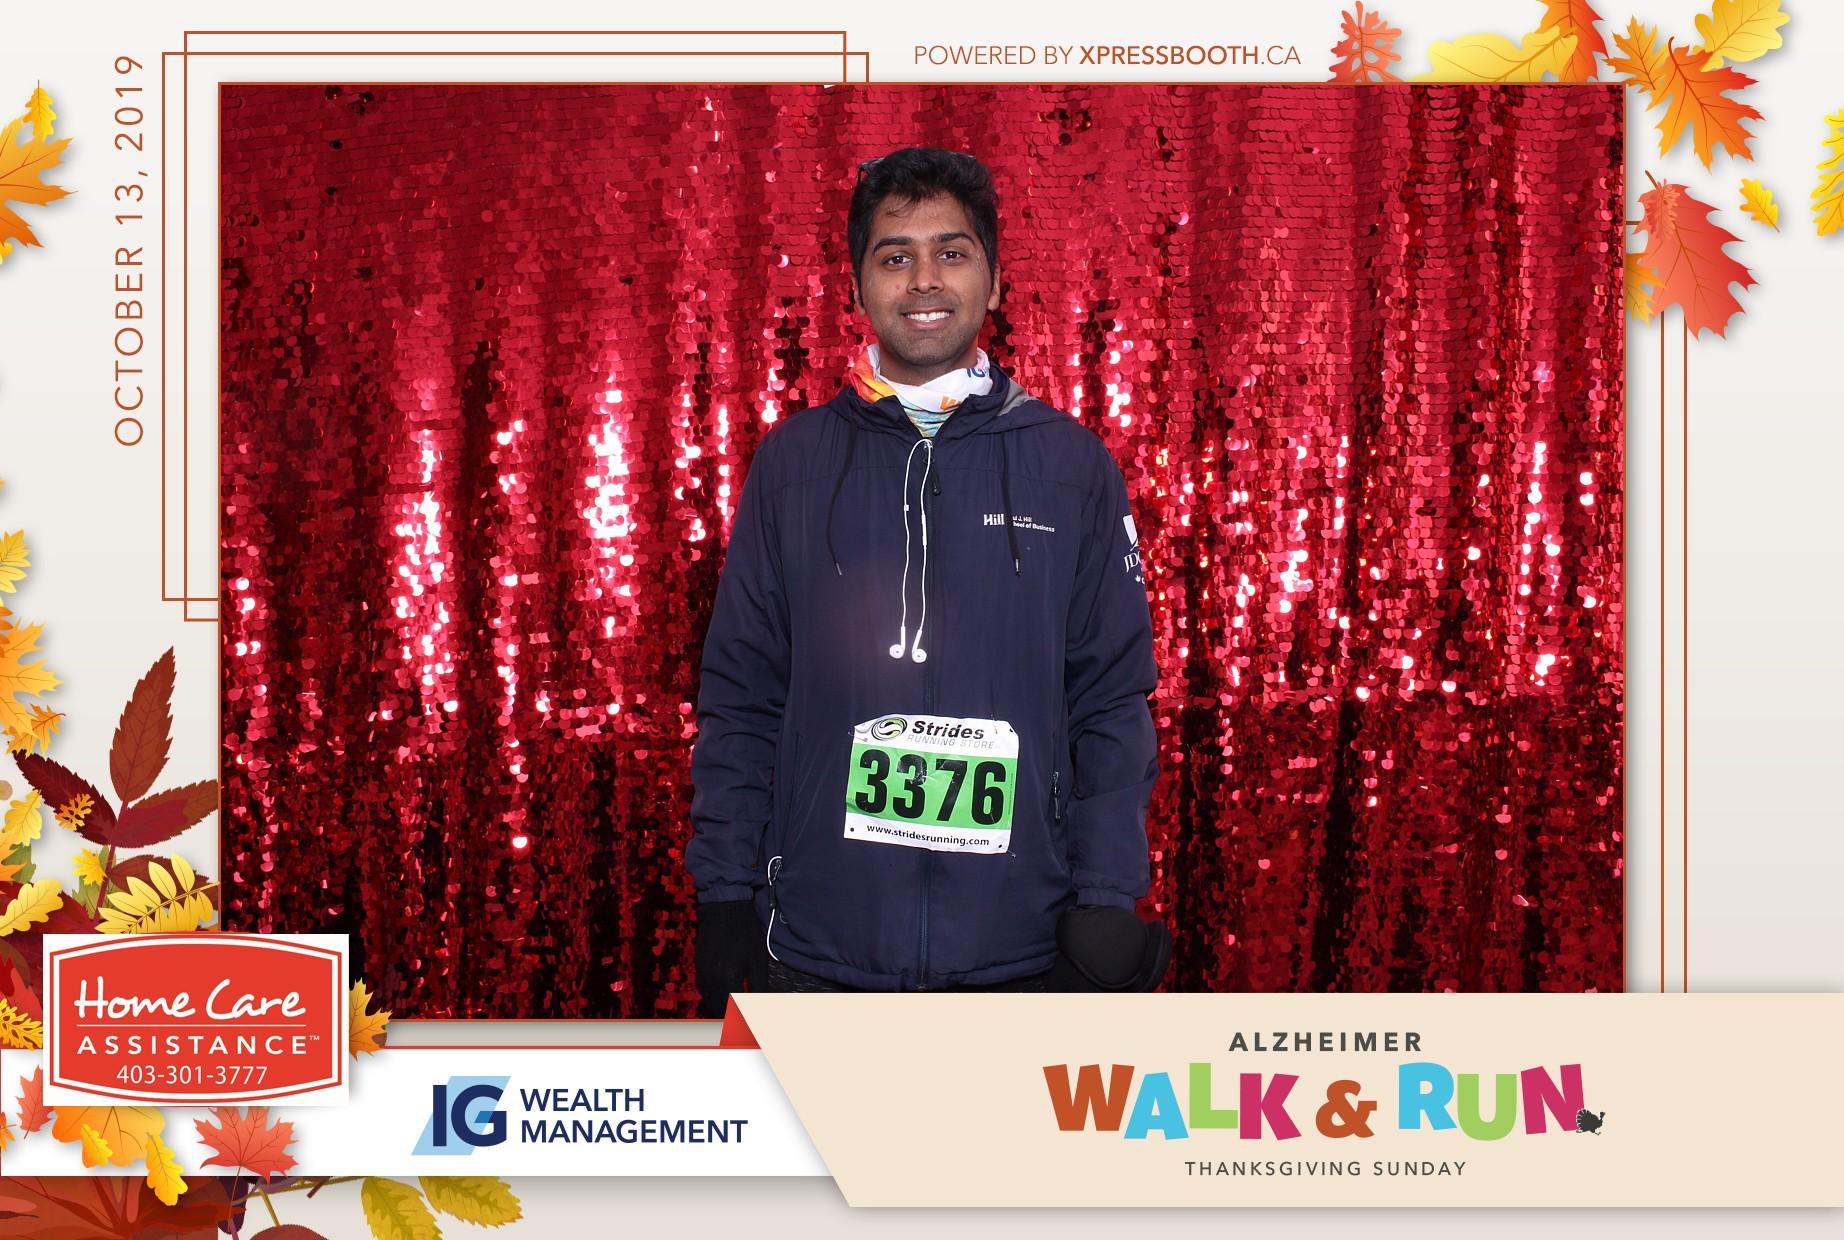 WalkRunAlzheimerSociety-0231-PRINT